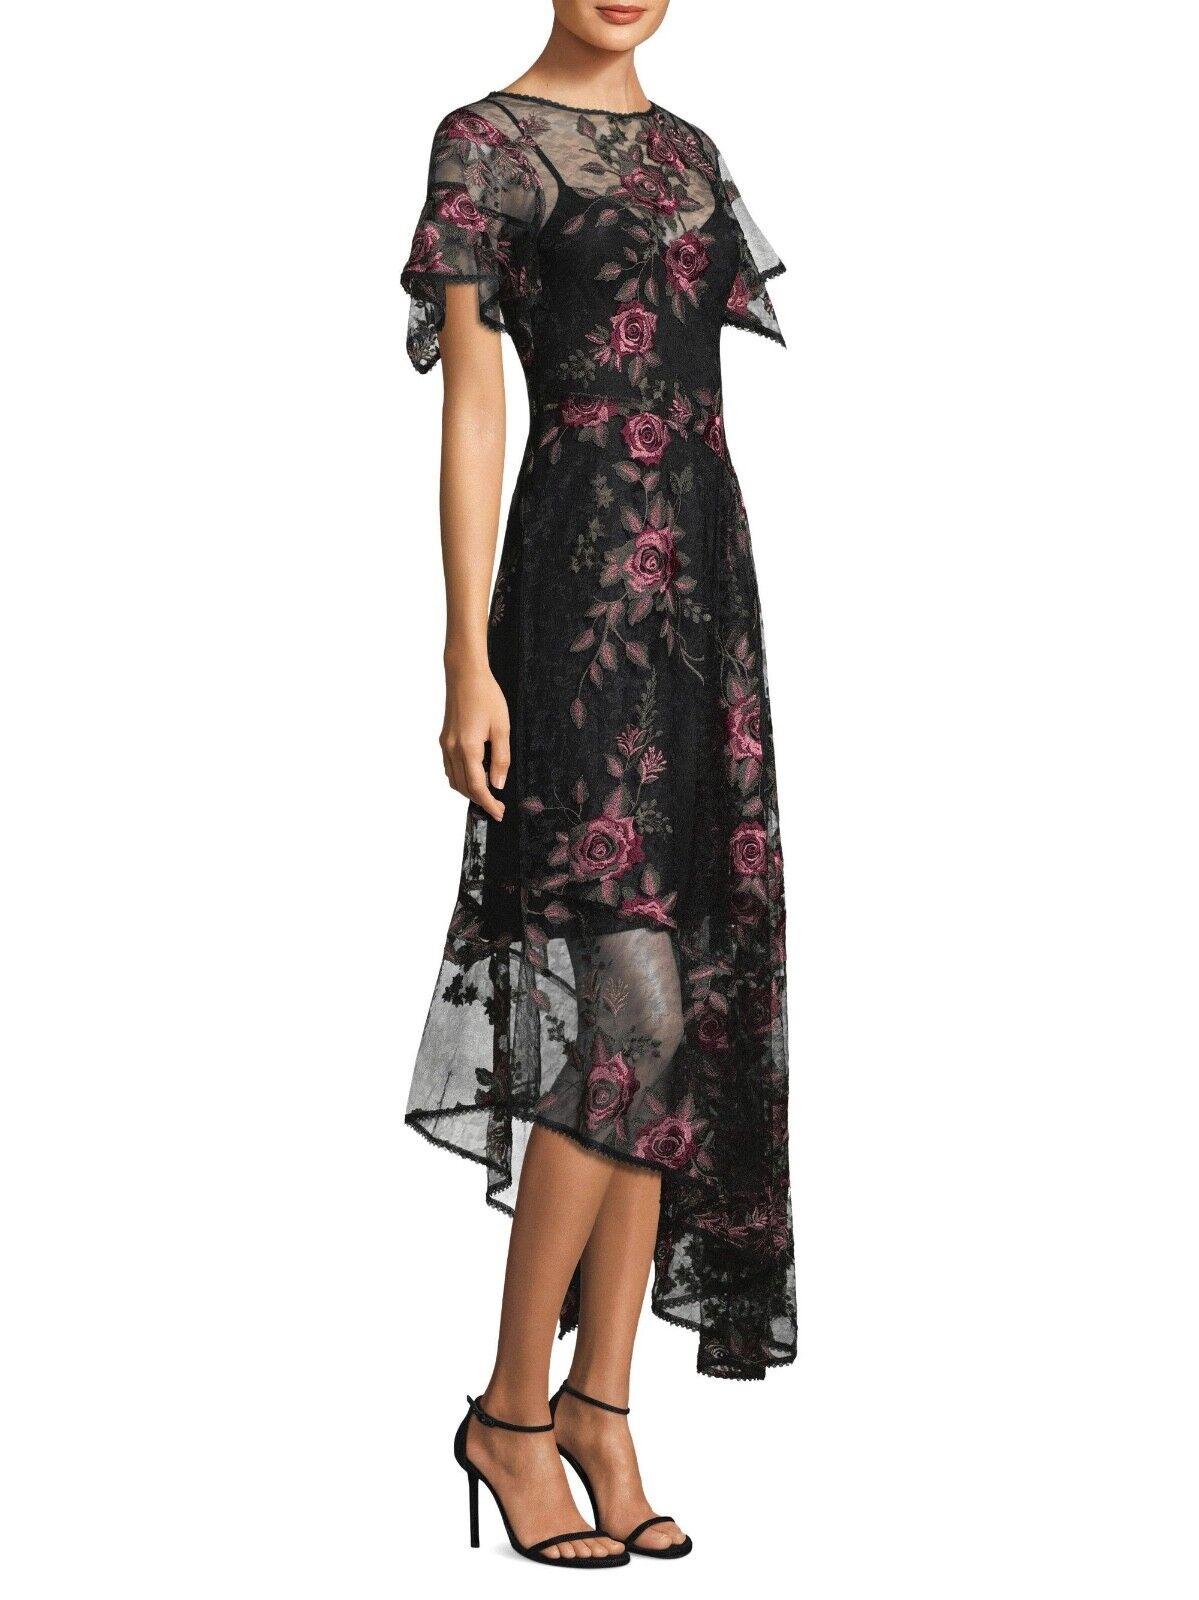 2d52a841f6e3 Nuova Nanette Lepore Flamenco Redingote Etichetta con nralbk4594-Vestiti